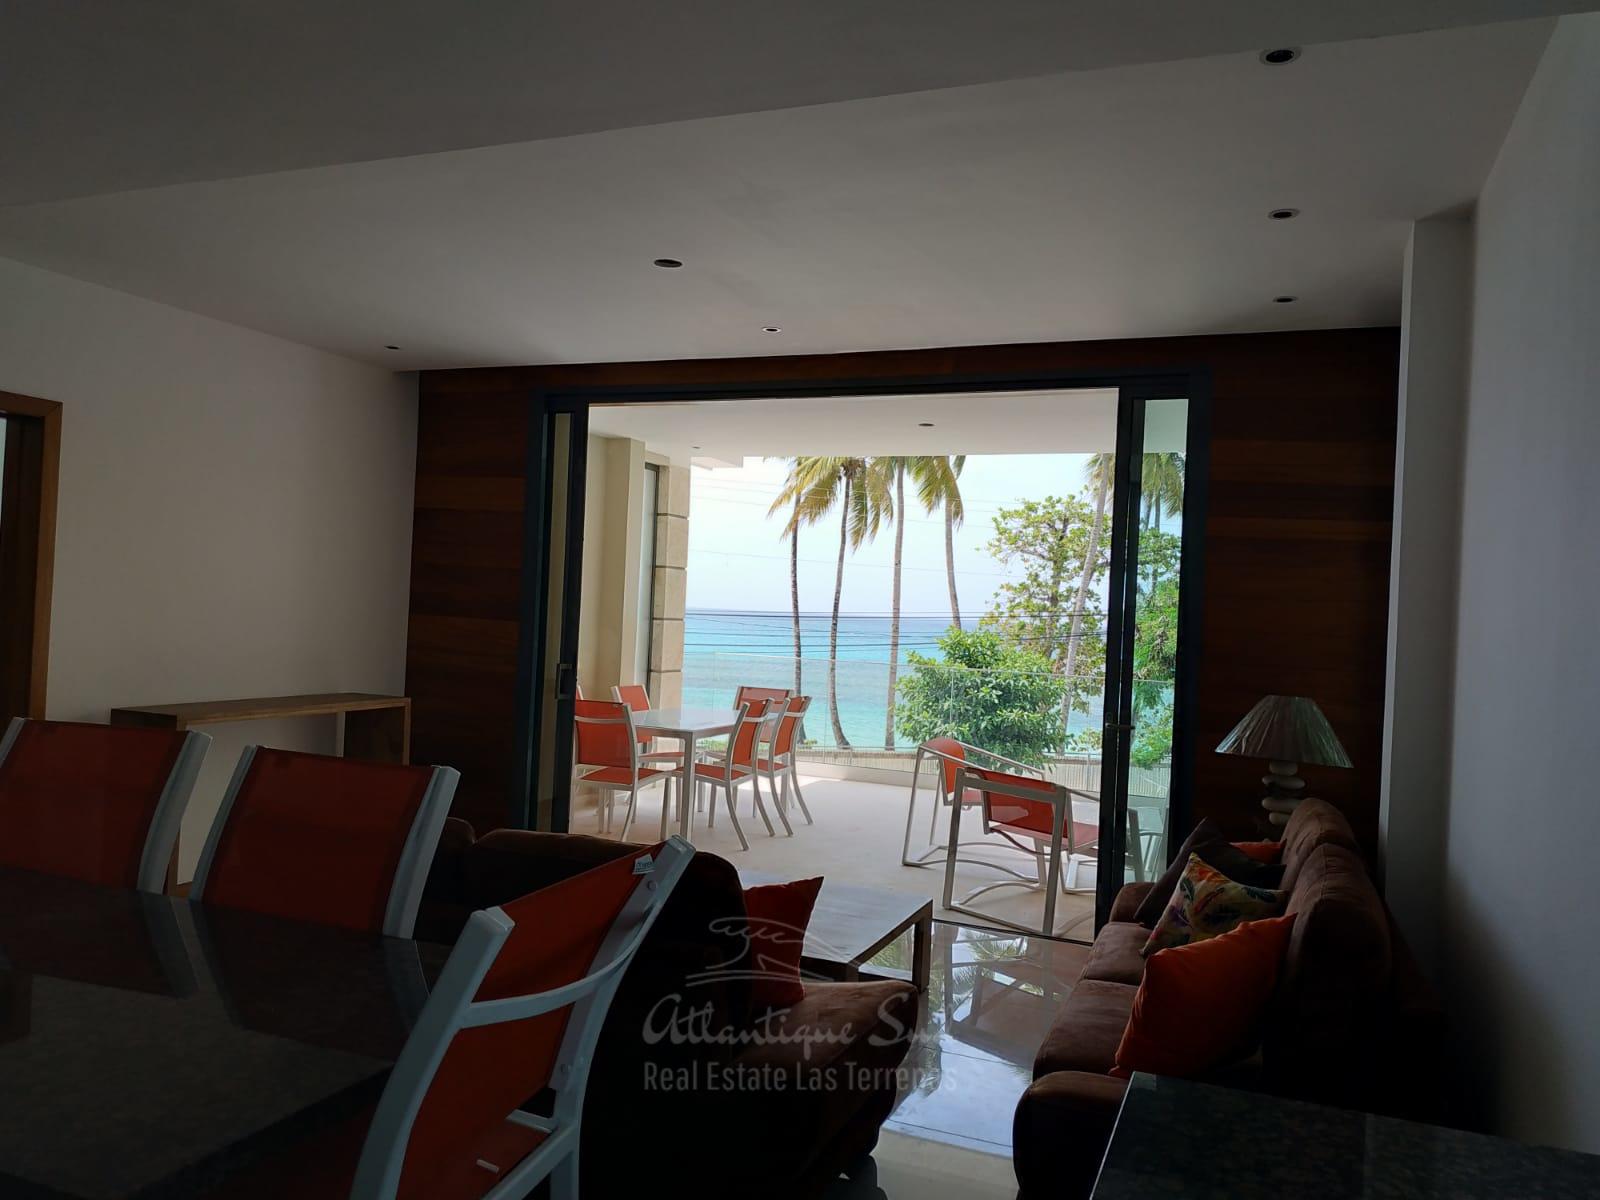 apartment for sale las terrenas beachfront condo8.jpg